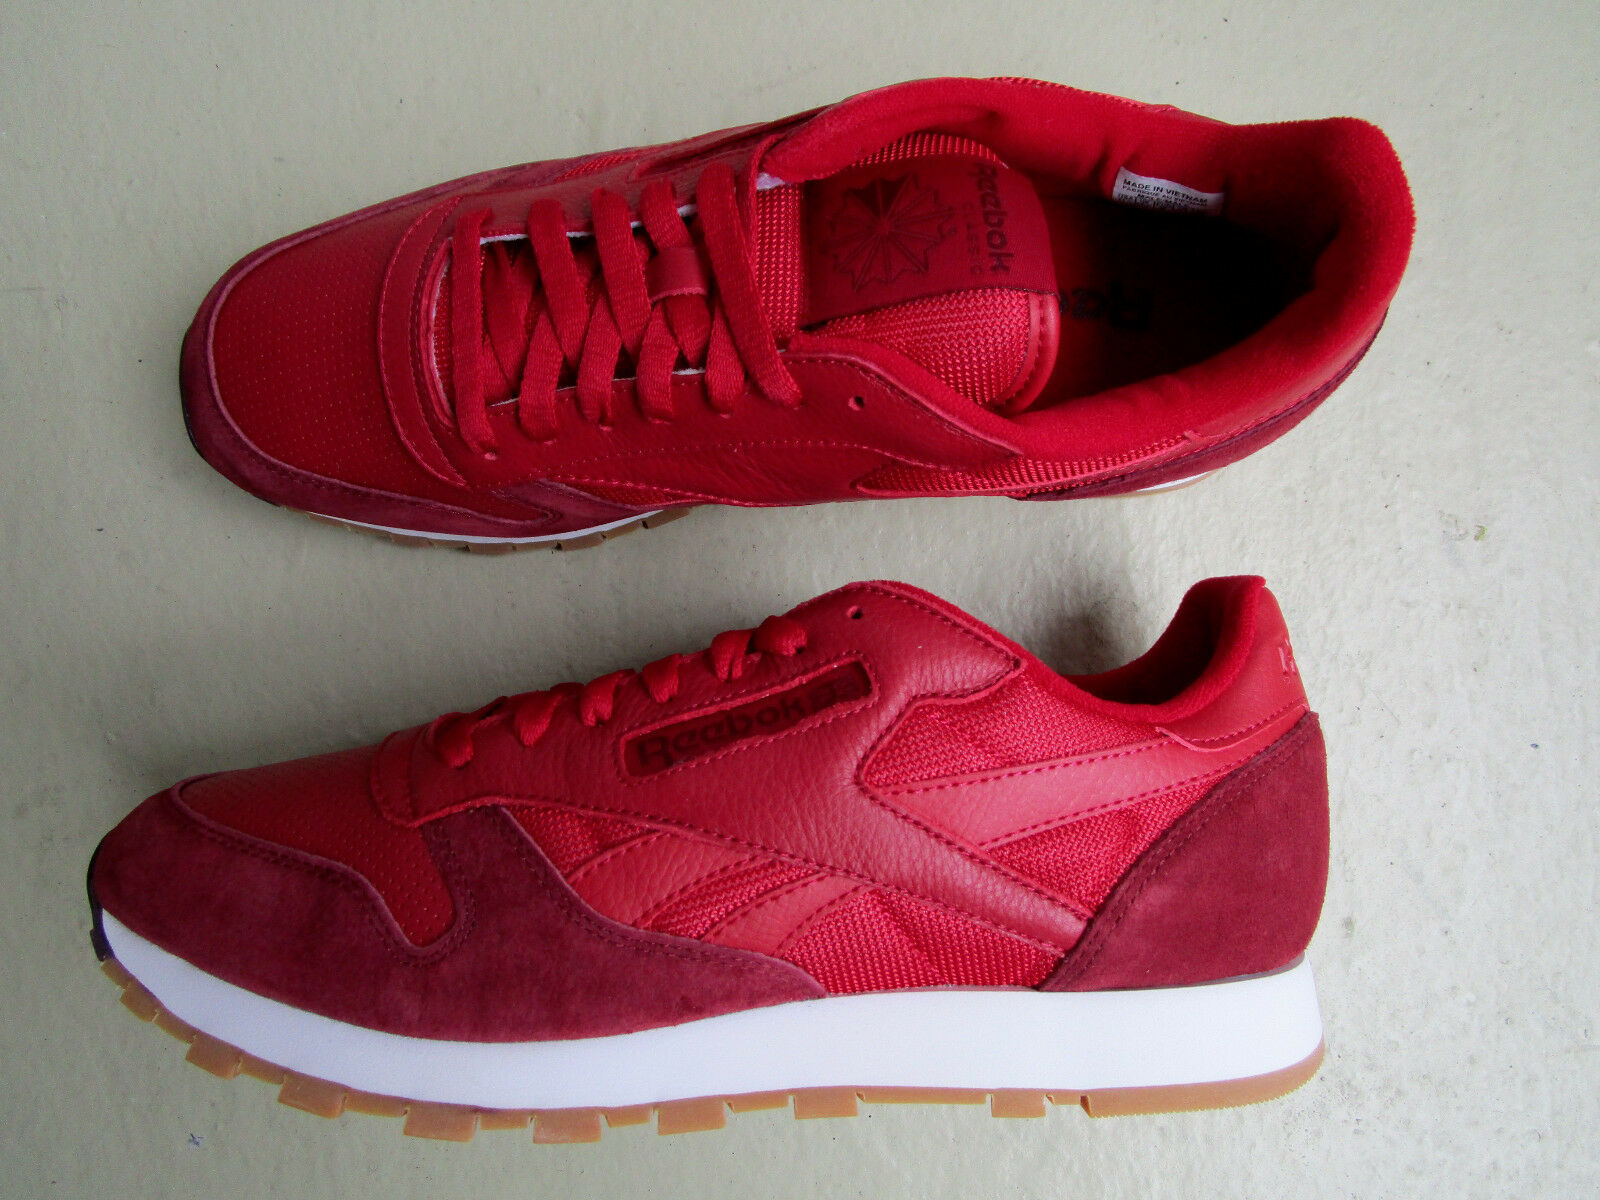 Kendrick Lamar X Reebok Classic Leather 45 Perfect Split Flash Red/Merlot White